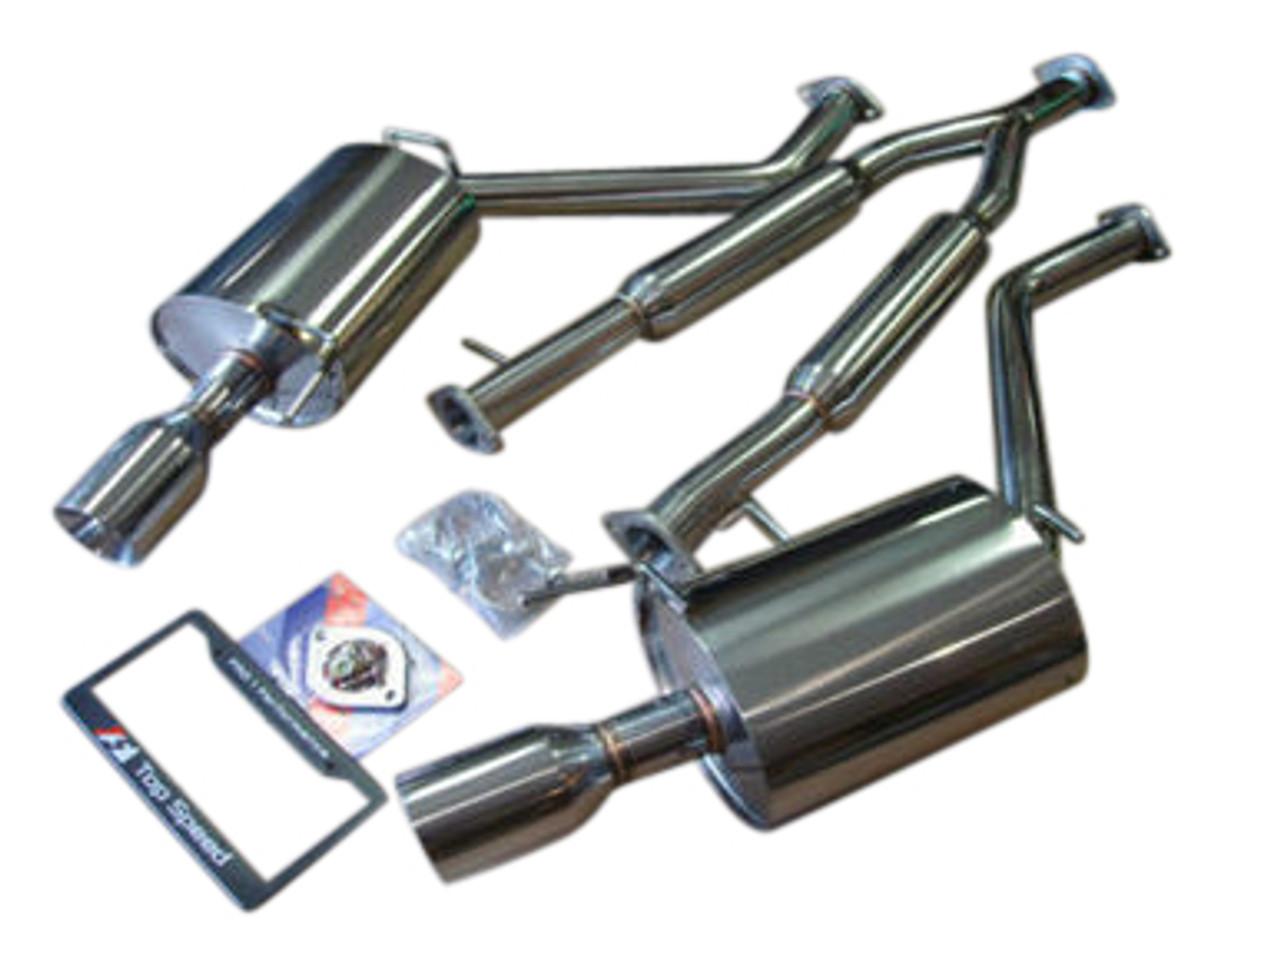 infiniti g35 g37 sedan 07 13 top speed pro 1 y pipe back exhaust system bevel edge tips